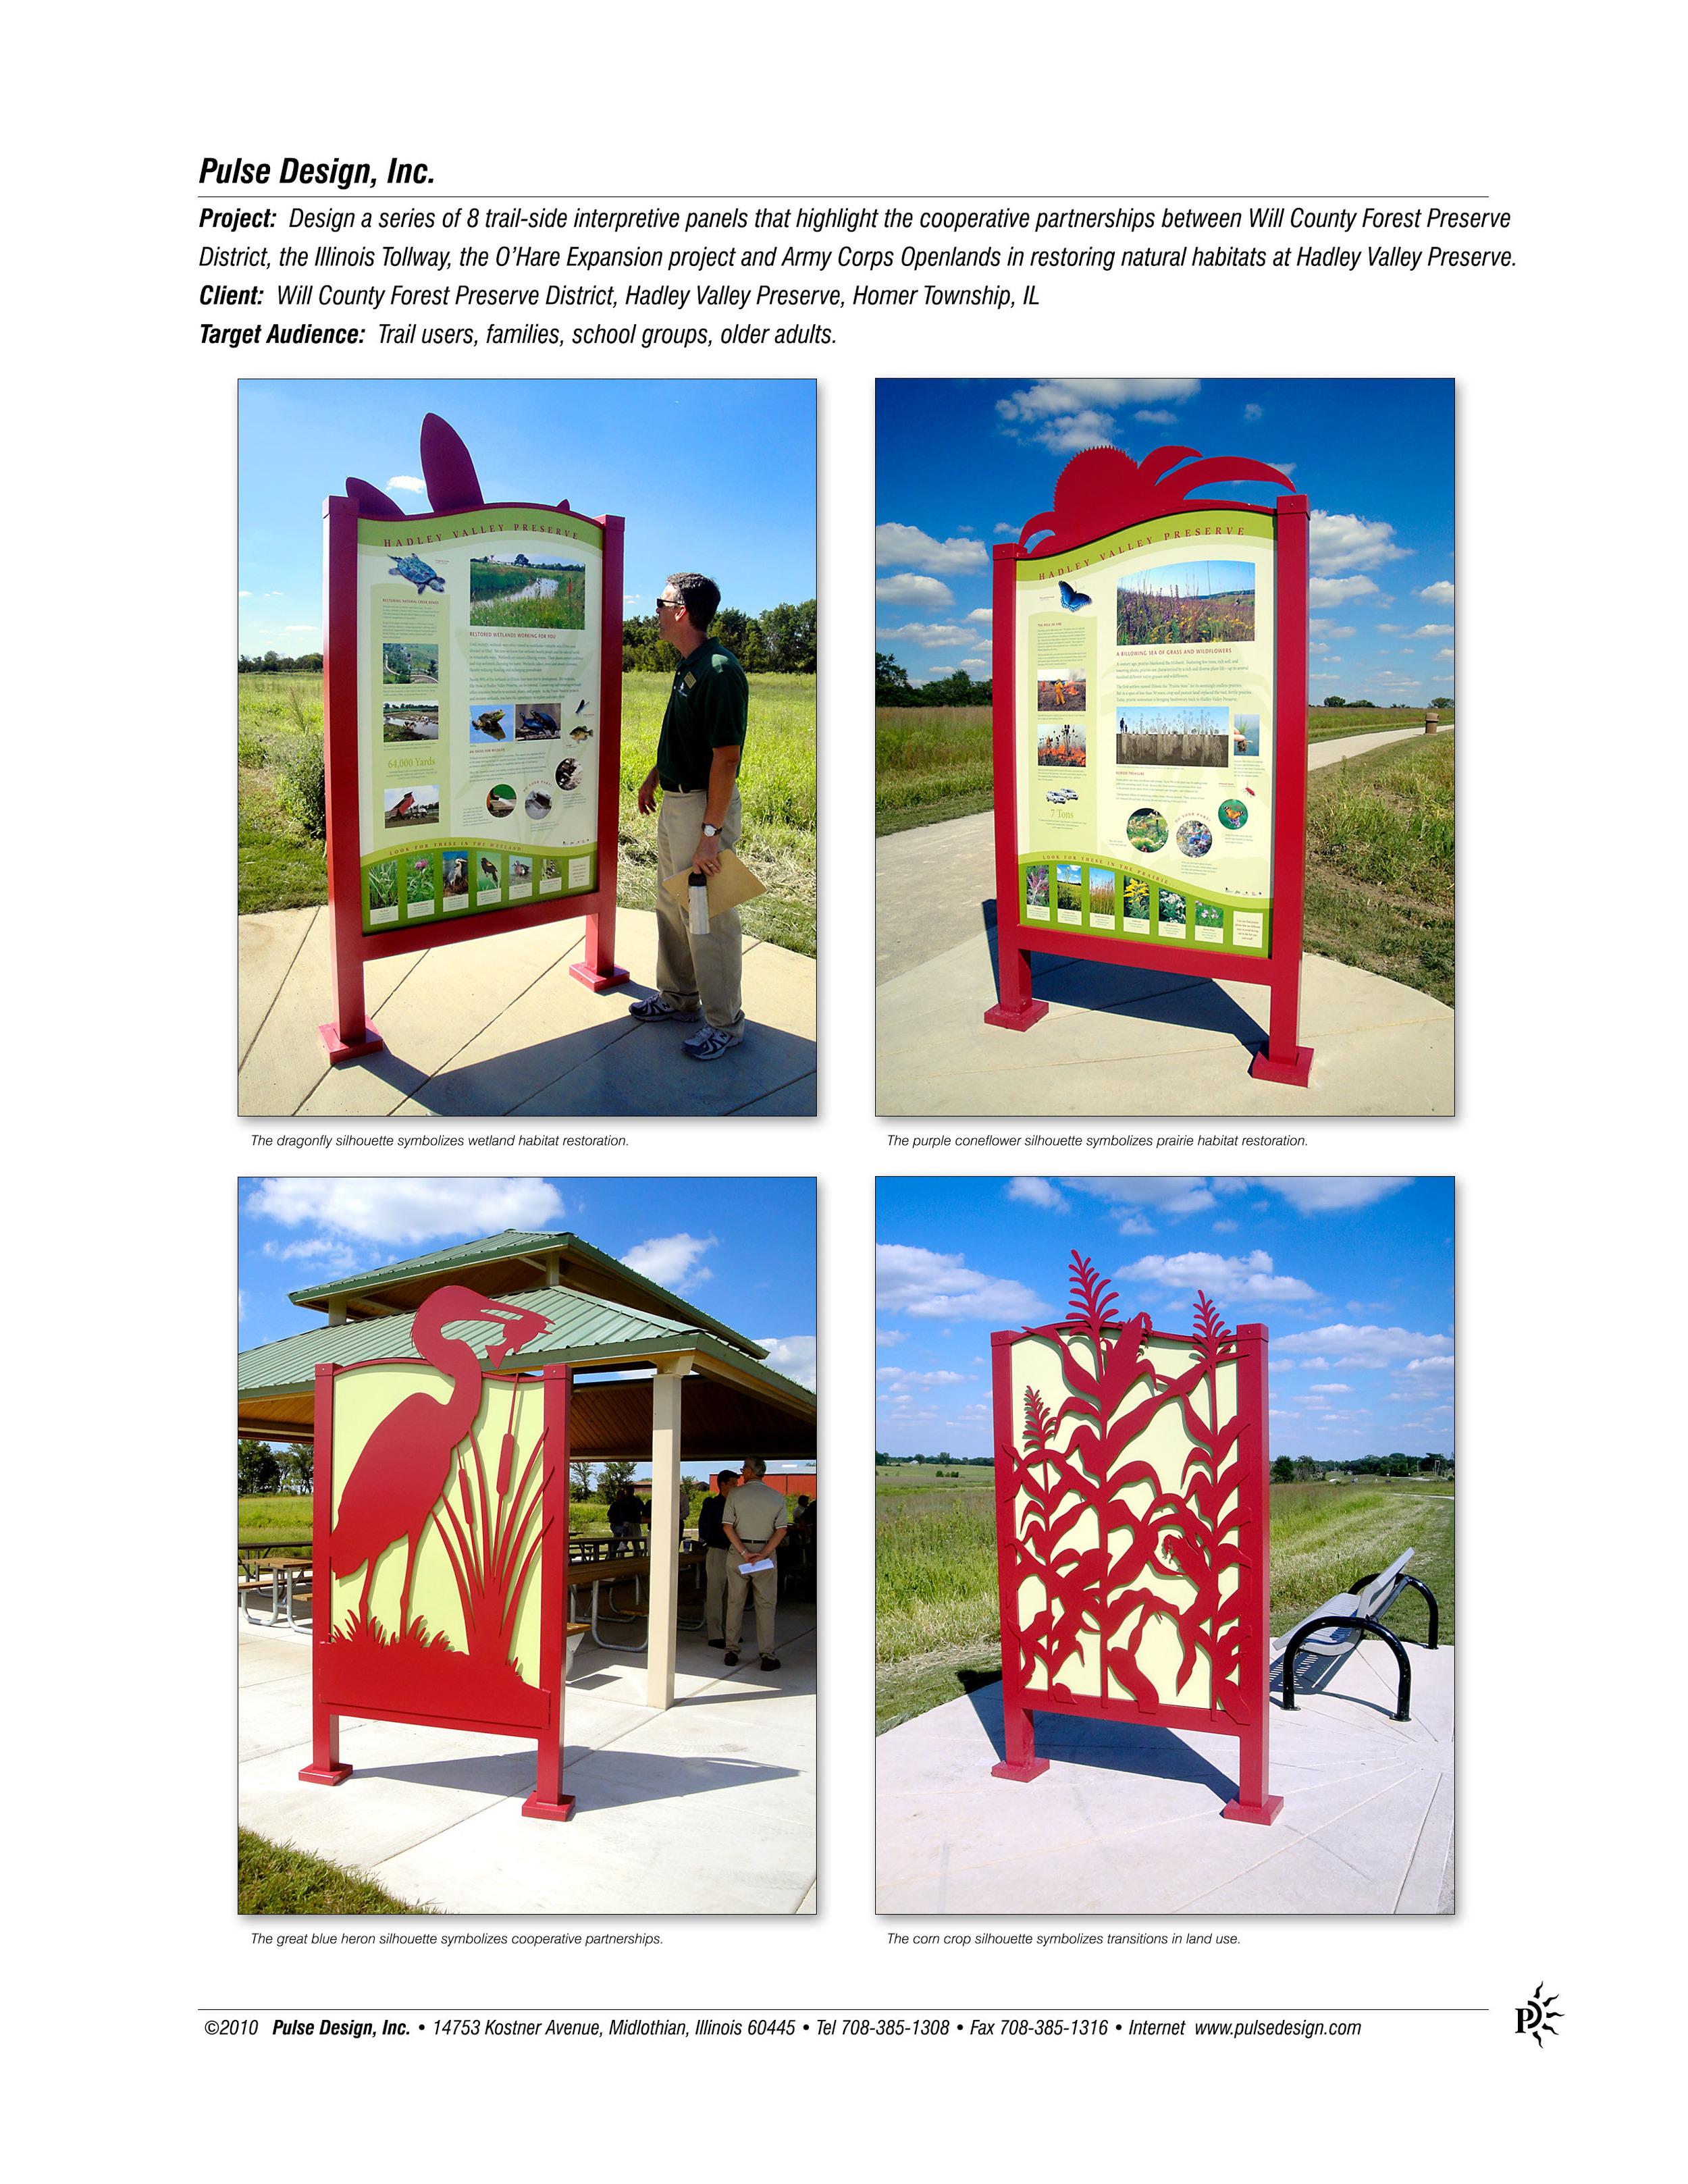 Hadley-Valley-Trail-Signs-1-Pulse-Design-Inc.jpg